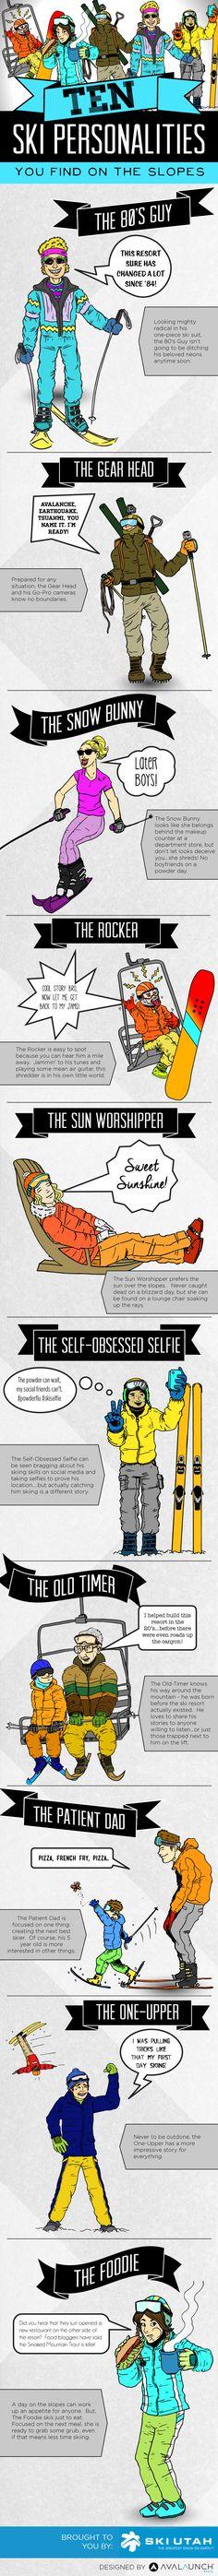 10 Ski Personalities